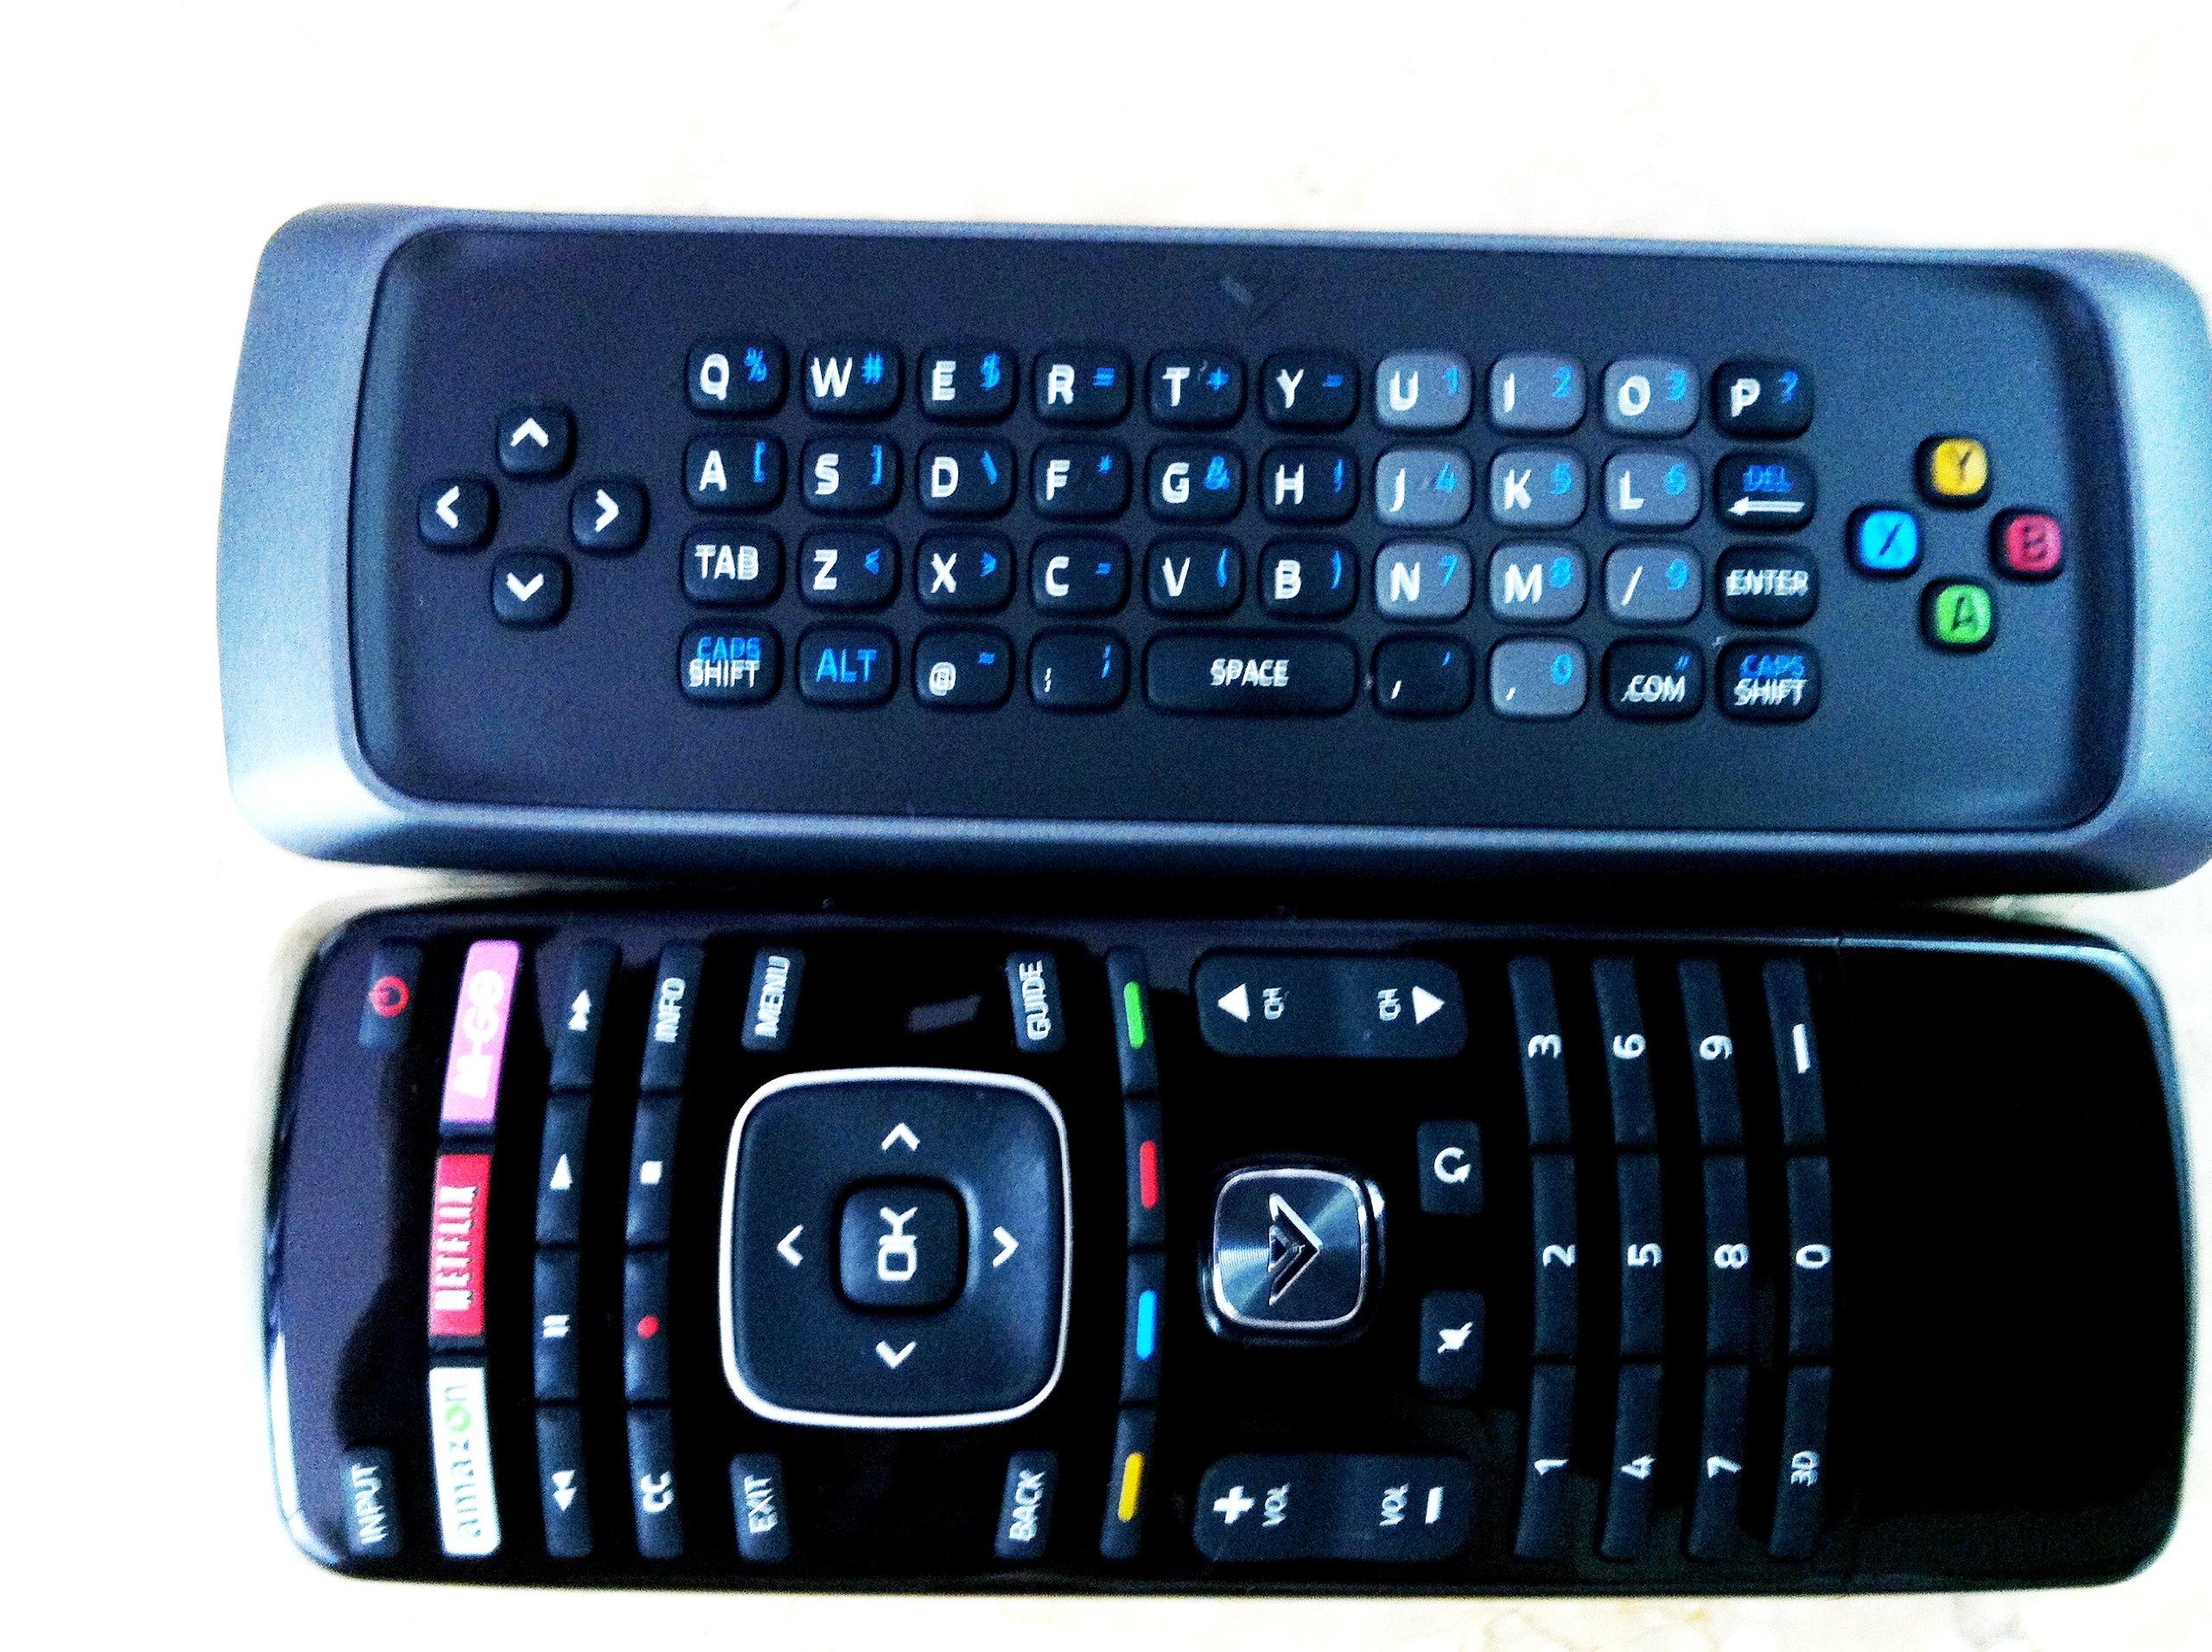 Original VIZIO XRT303 Qwerty keyboard remote for M3D550KDE M3D470KDE M3D550KD 3D M-GO TV internet TV by Vizio